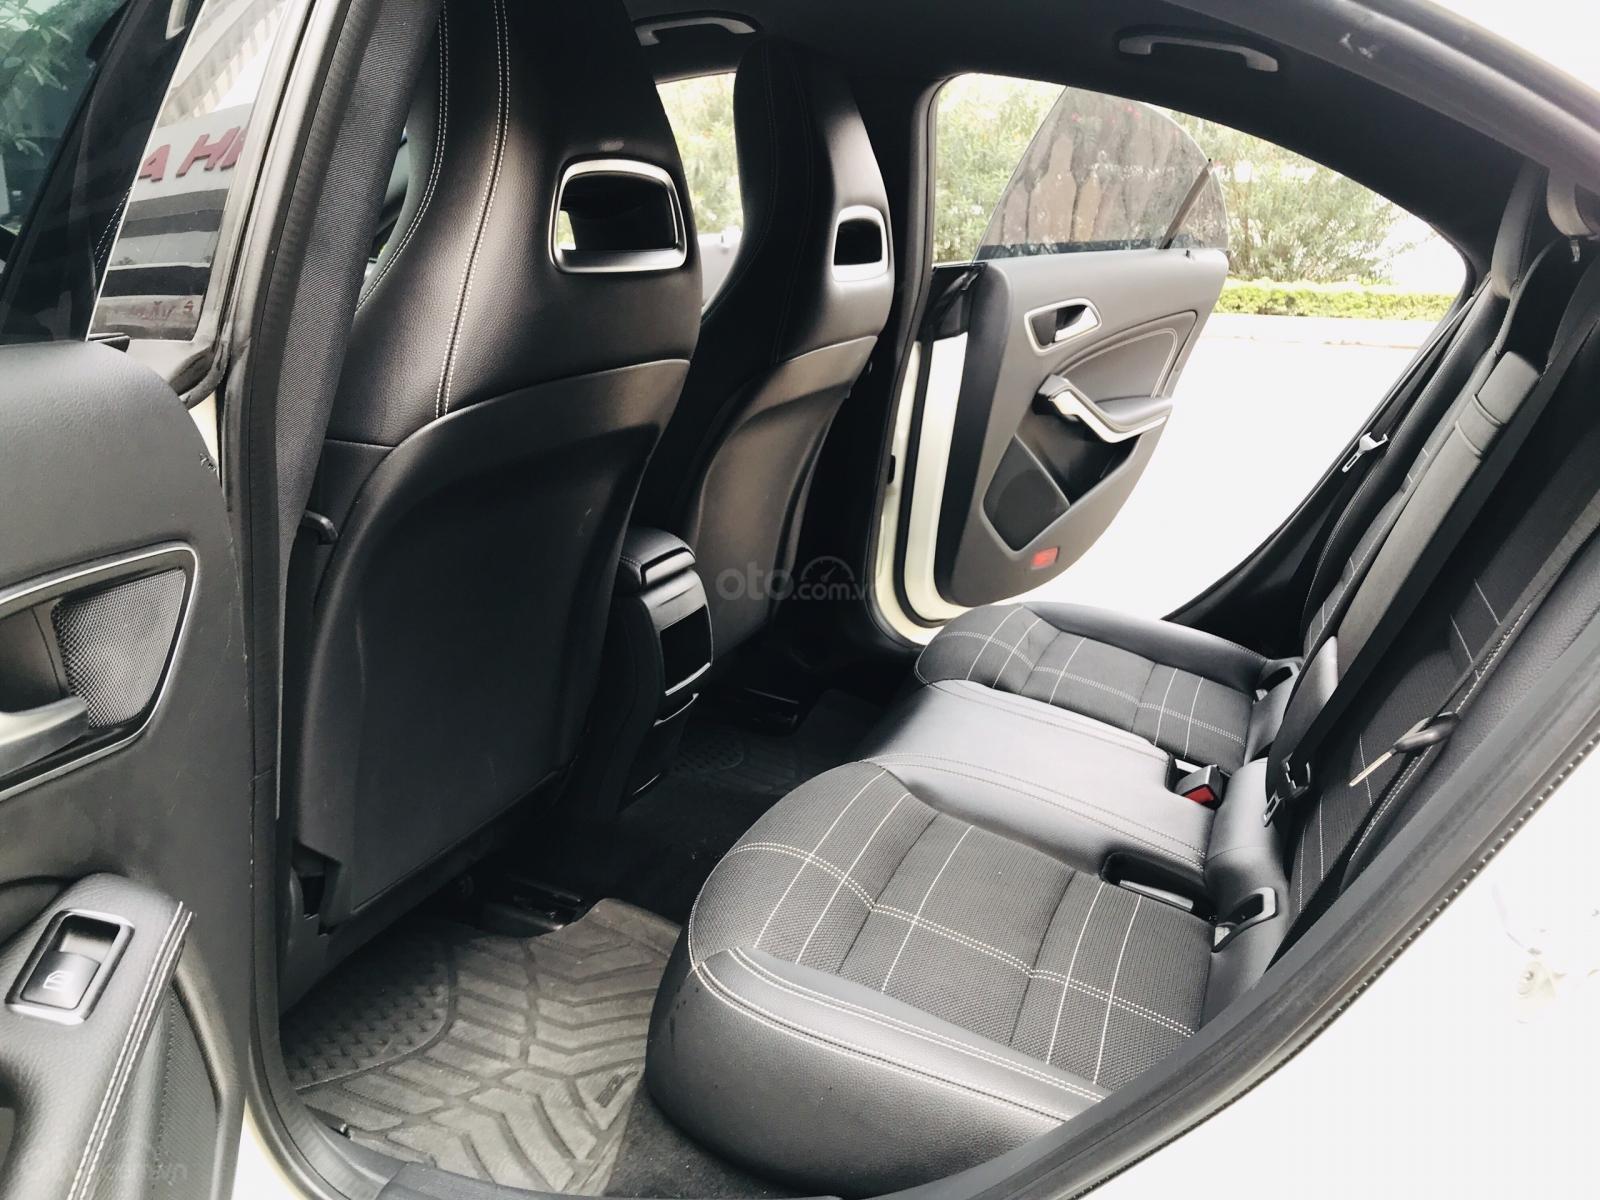 Mercedes Benz CLA 200 model 2017, nhập khẩu, mới leng keng (9)